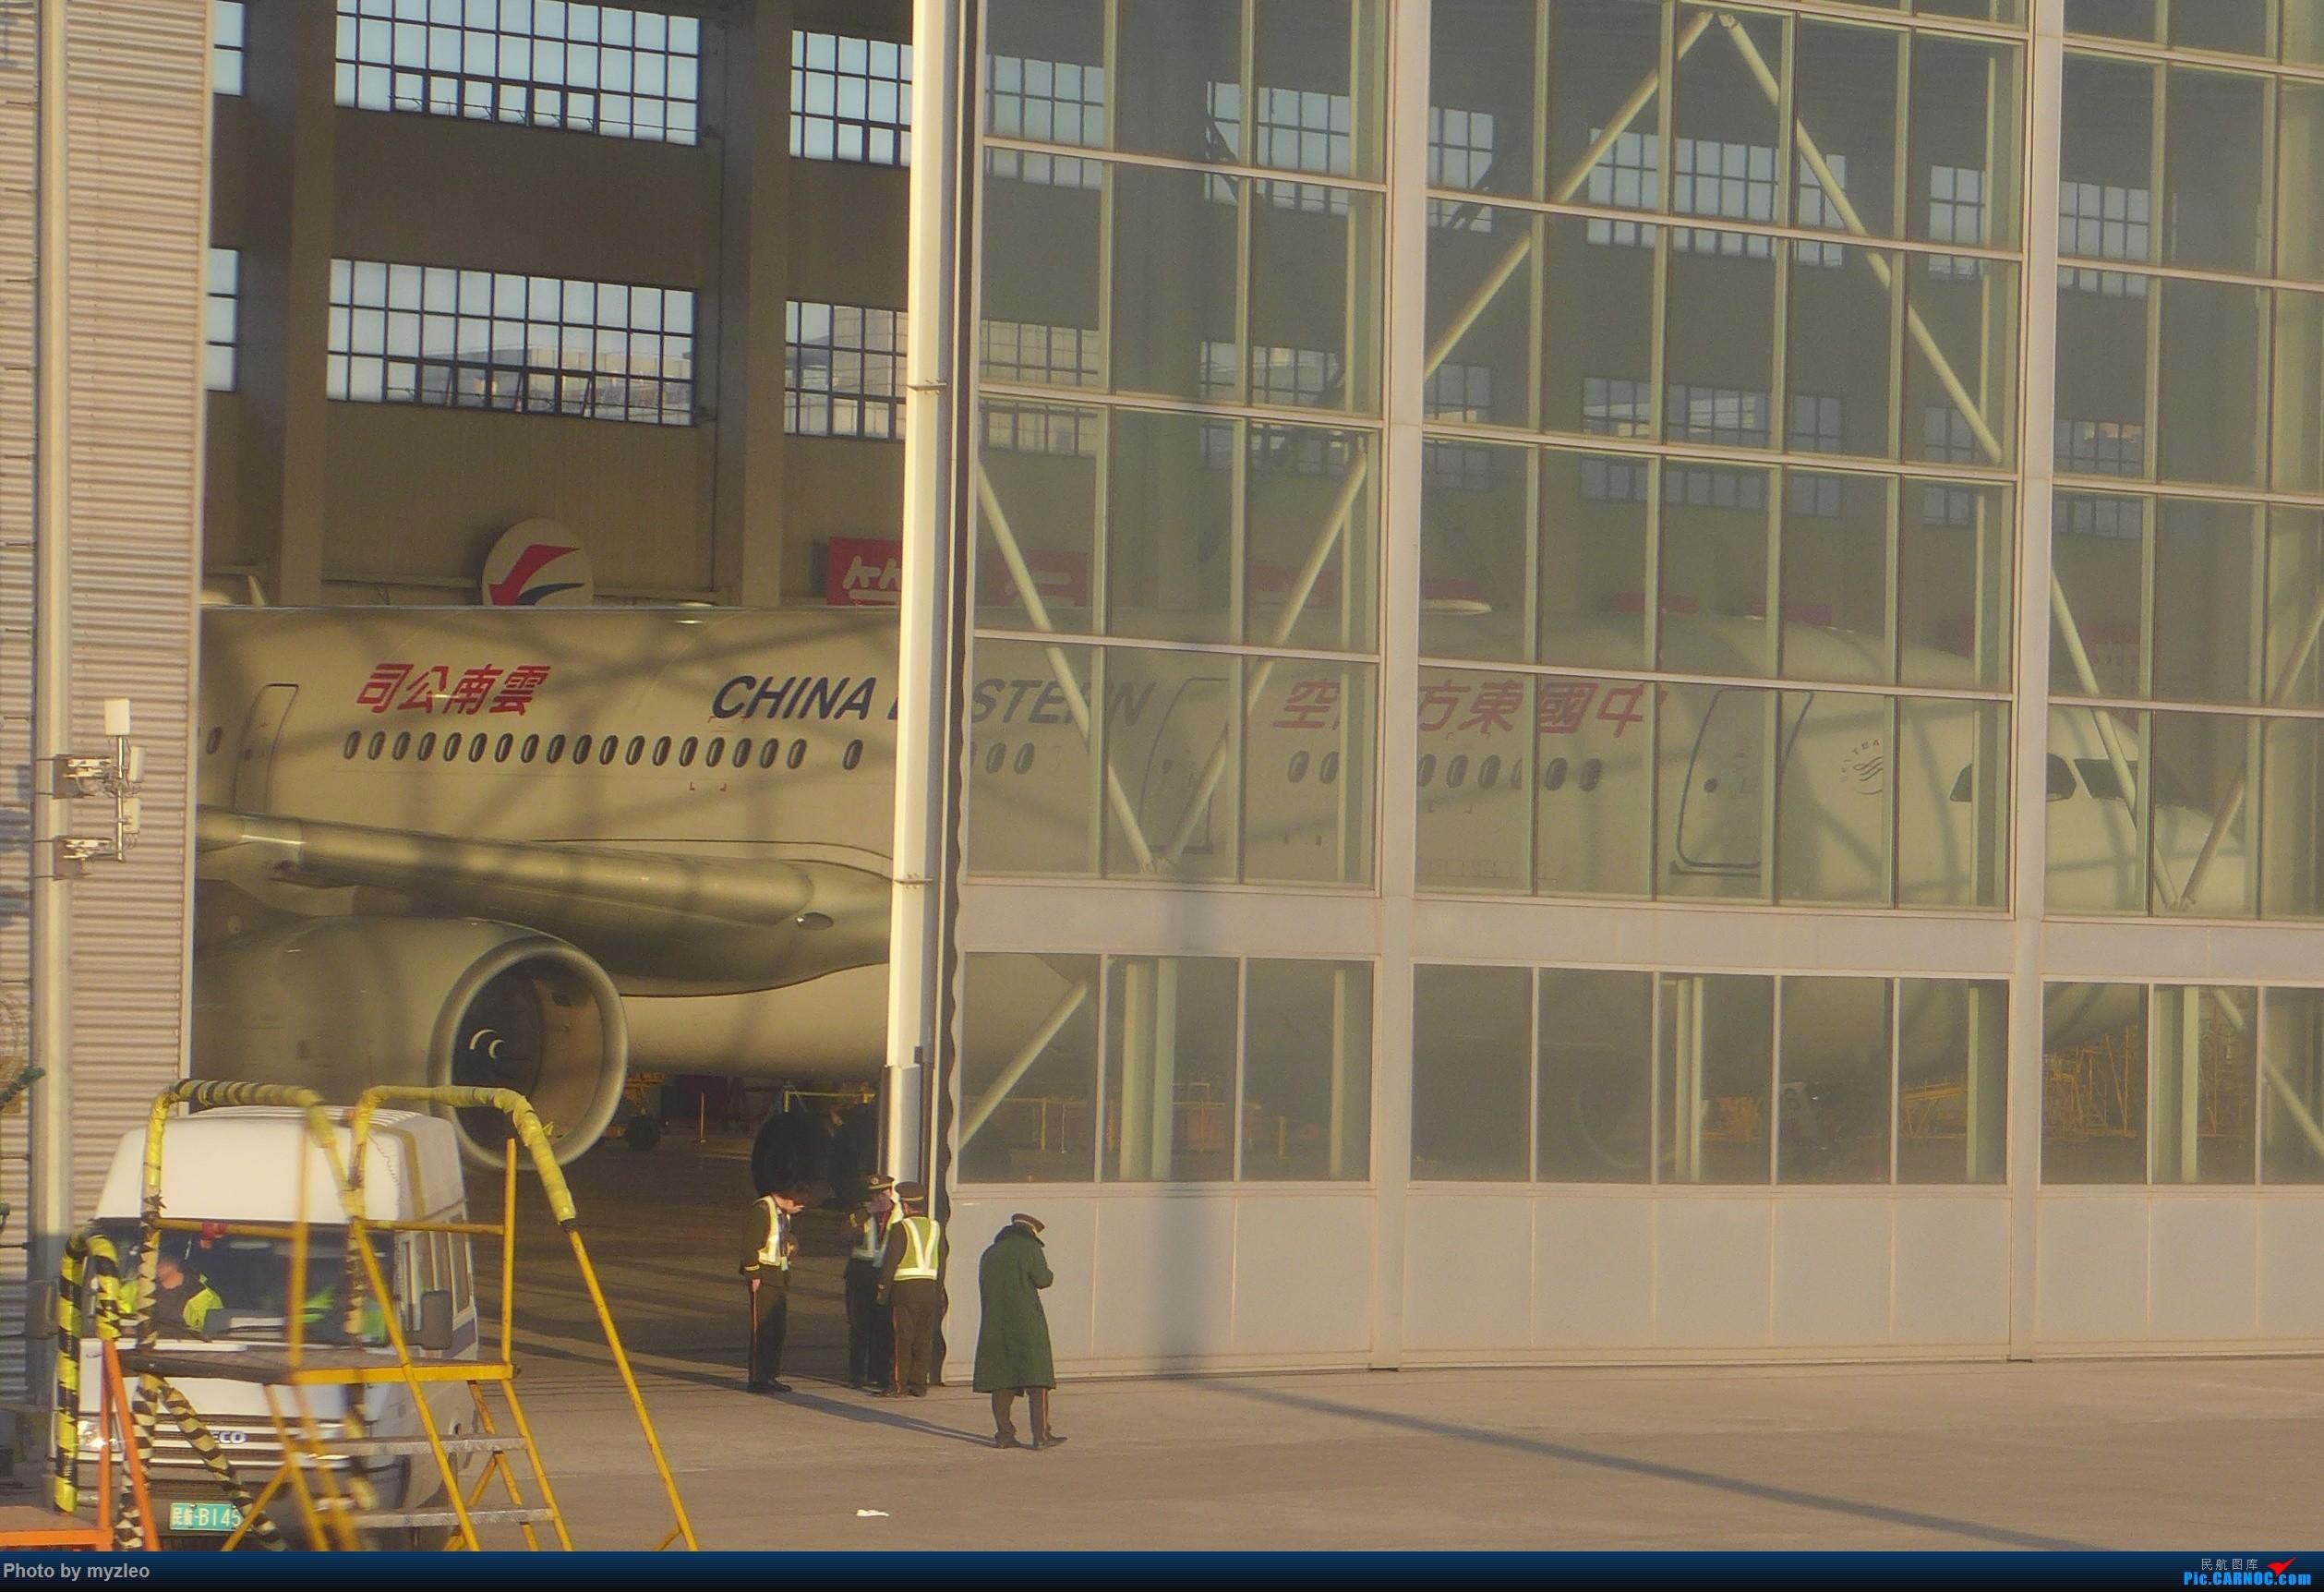 Re:[原创]【myzleo的游记1】六天五晚广州行——SHA-CAN上航商务舱初体验+广州城内 AIRBUS A330-300  中国上海虹桥国际机场